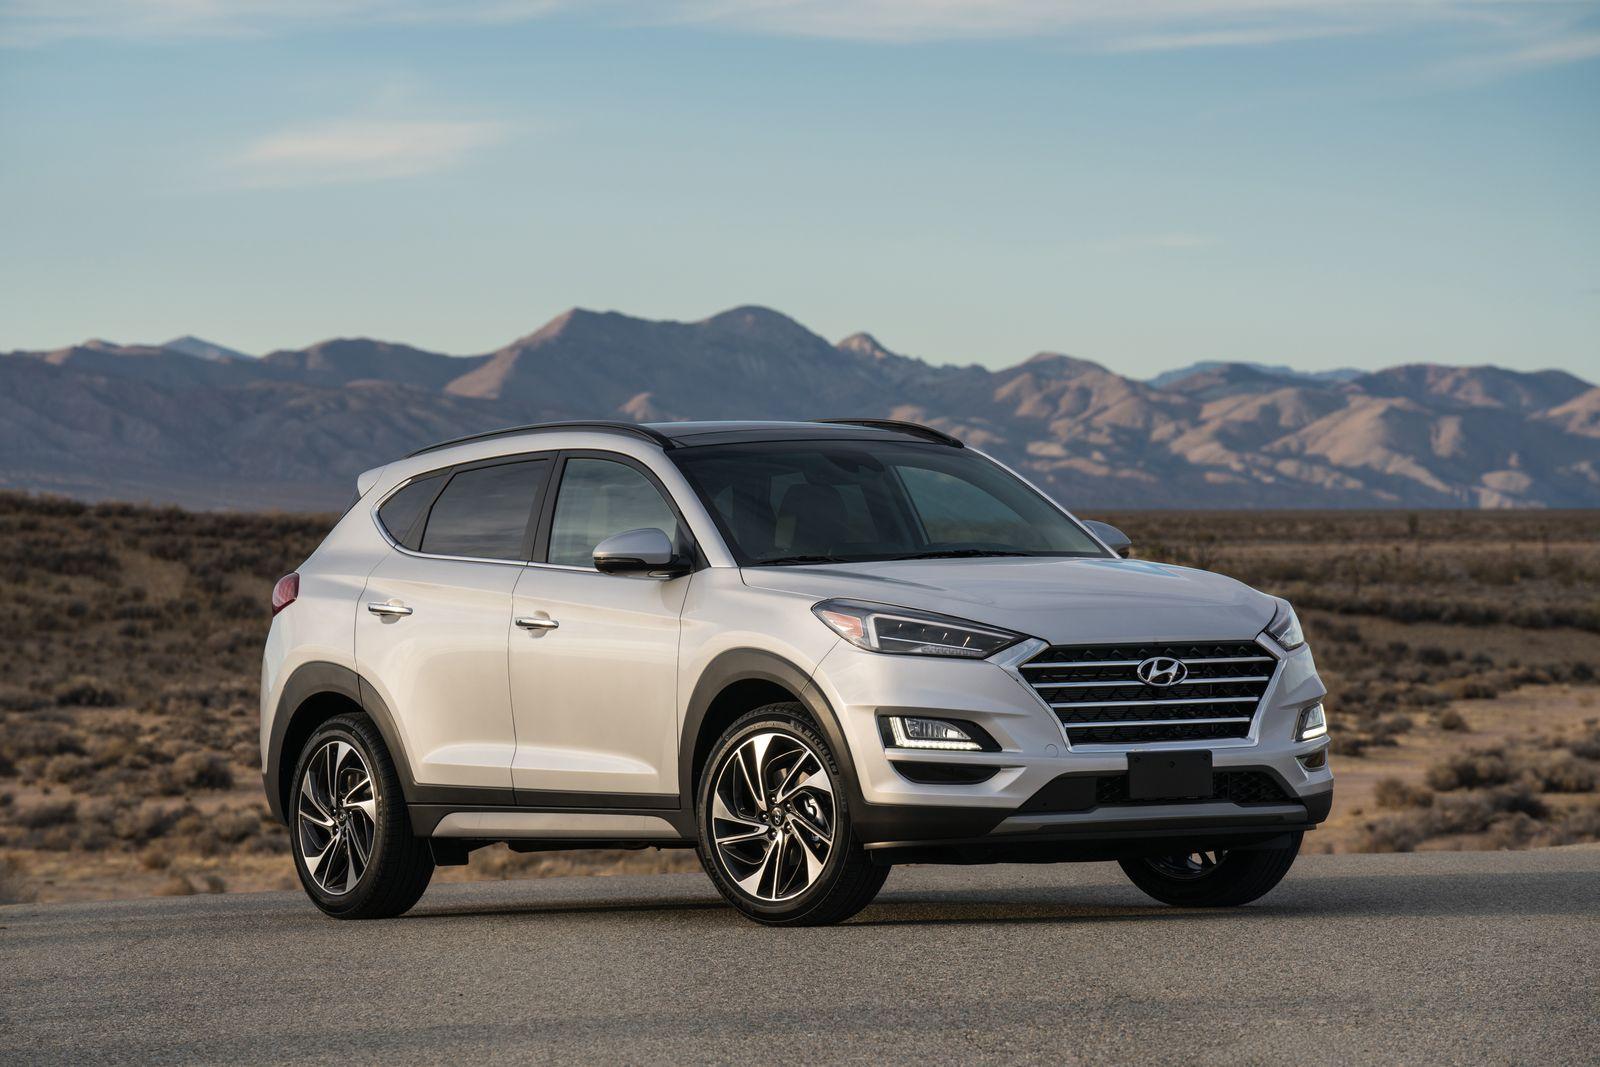 Izgled Hyundai Tucson modela iz 2019. godine